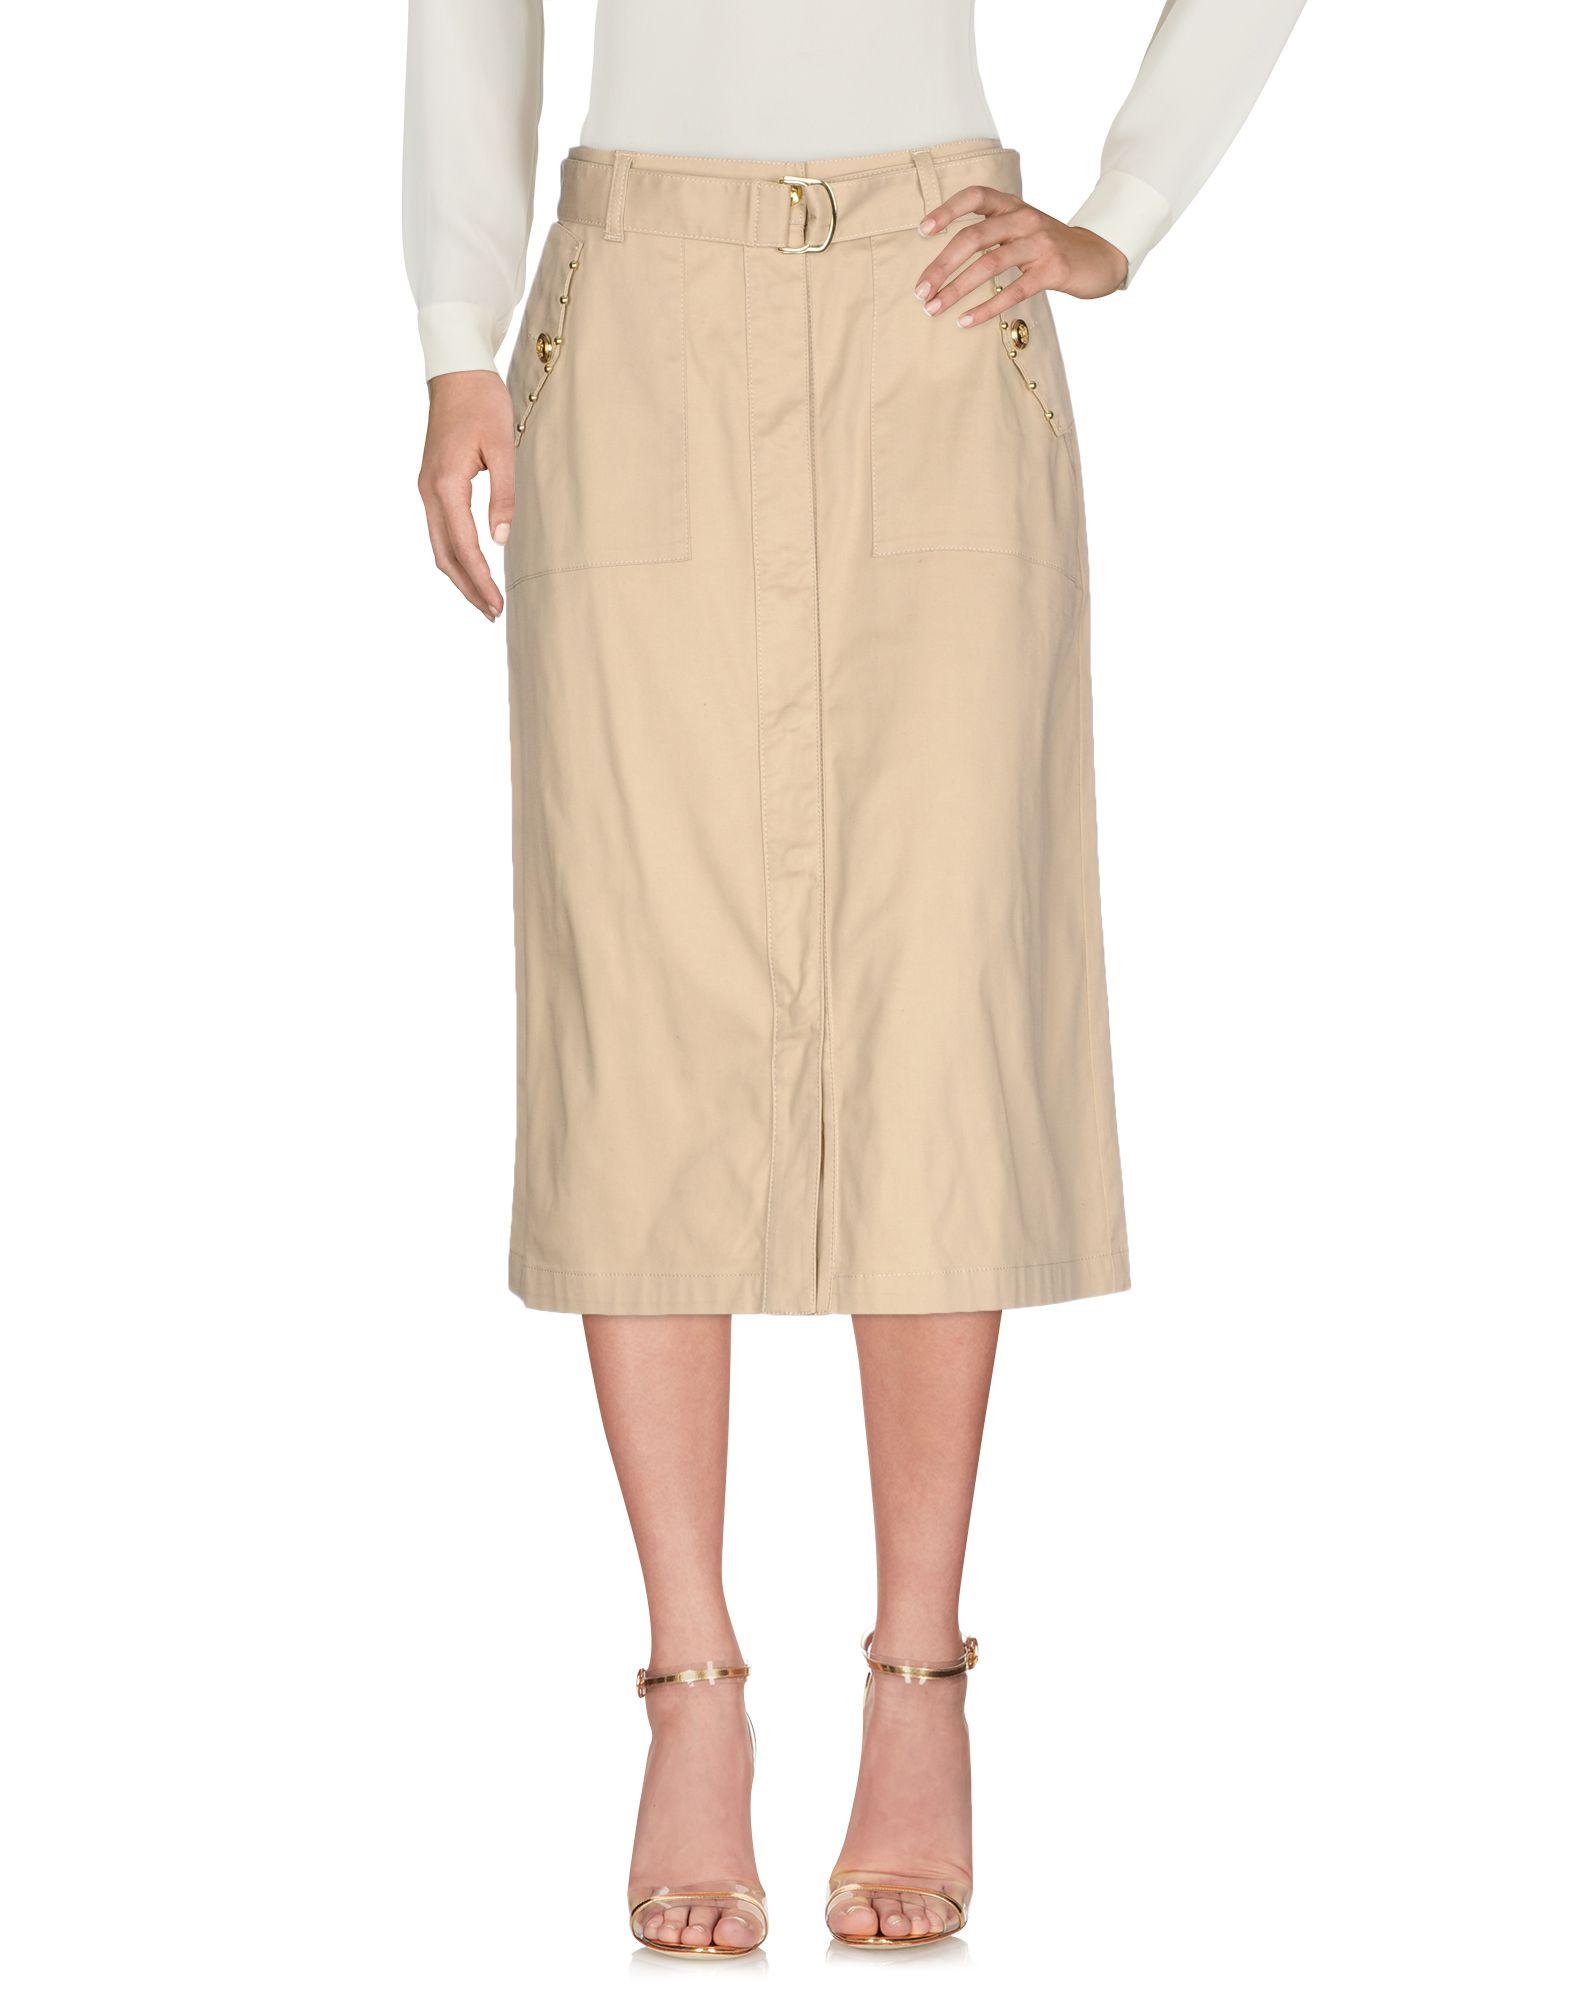 MARANI JEANS Юбка длиной 3/4 trussardi jeans юбка длиной 3 4